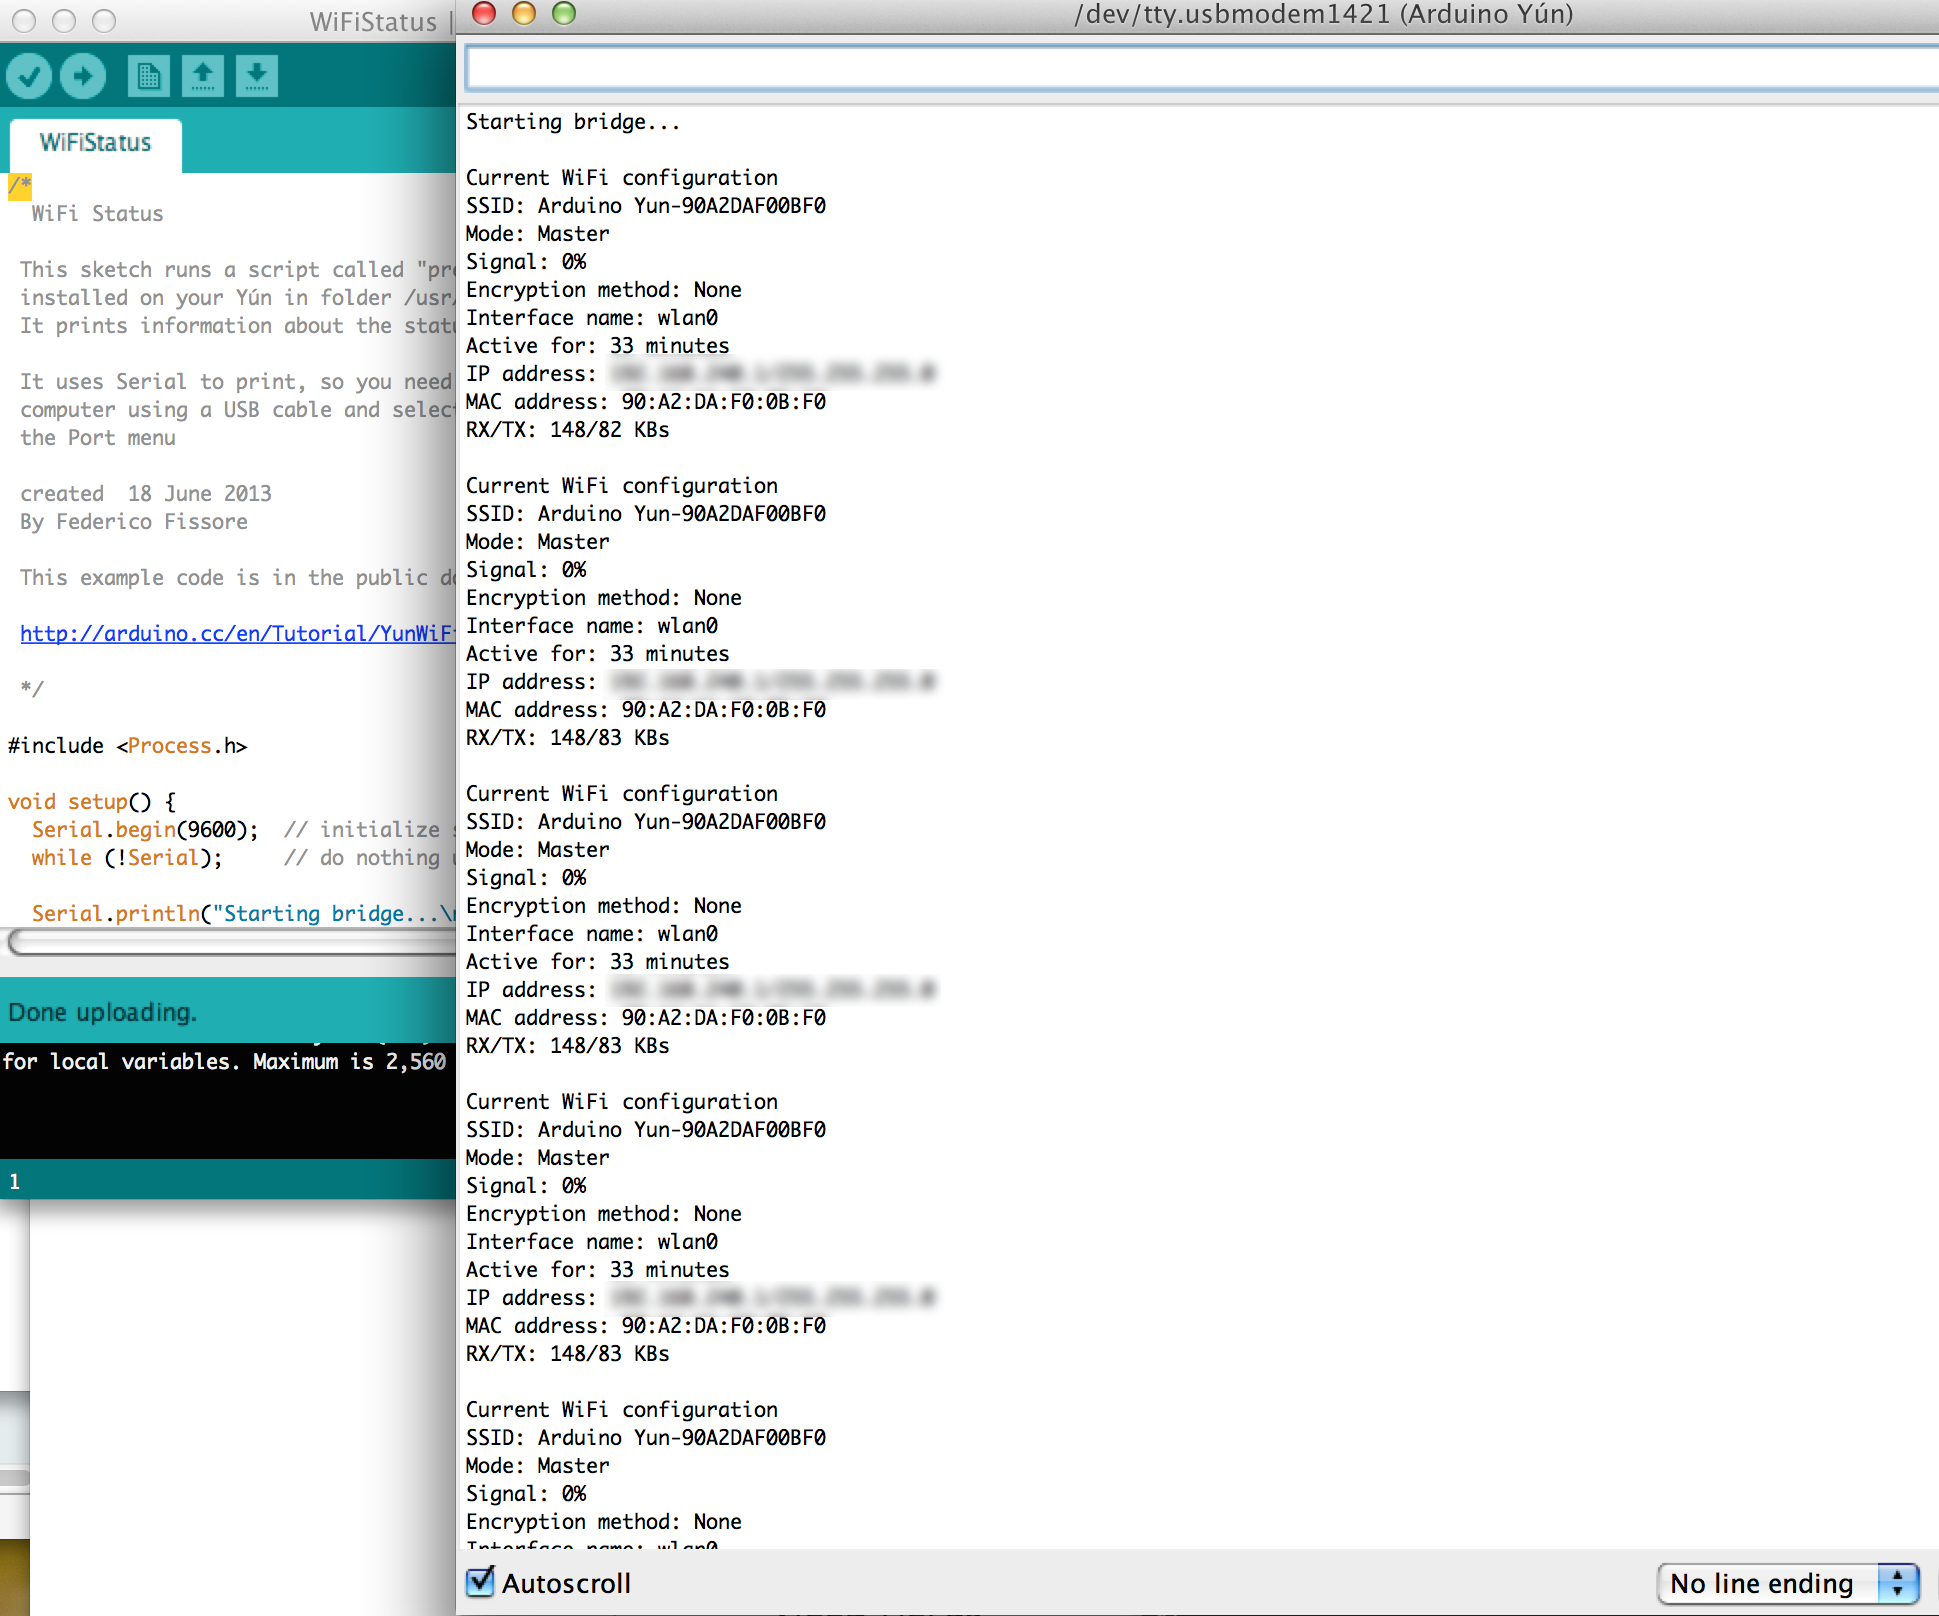 Checking you wifi status with Arduino Yun